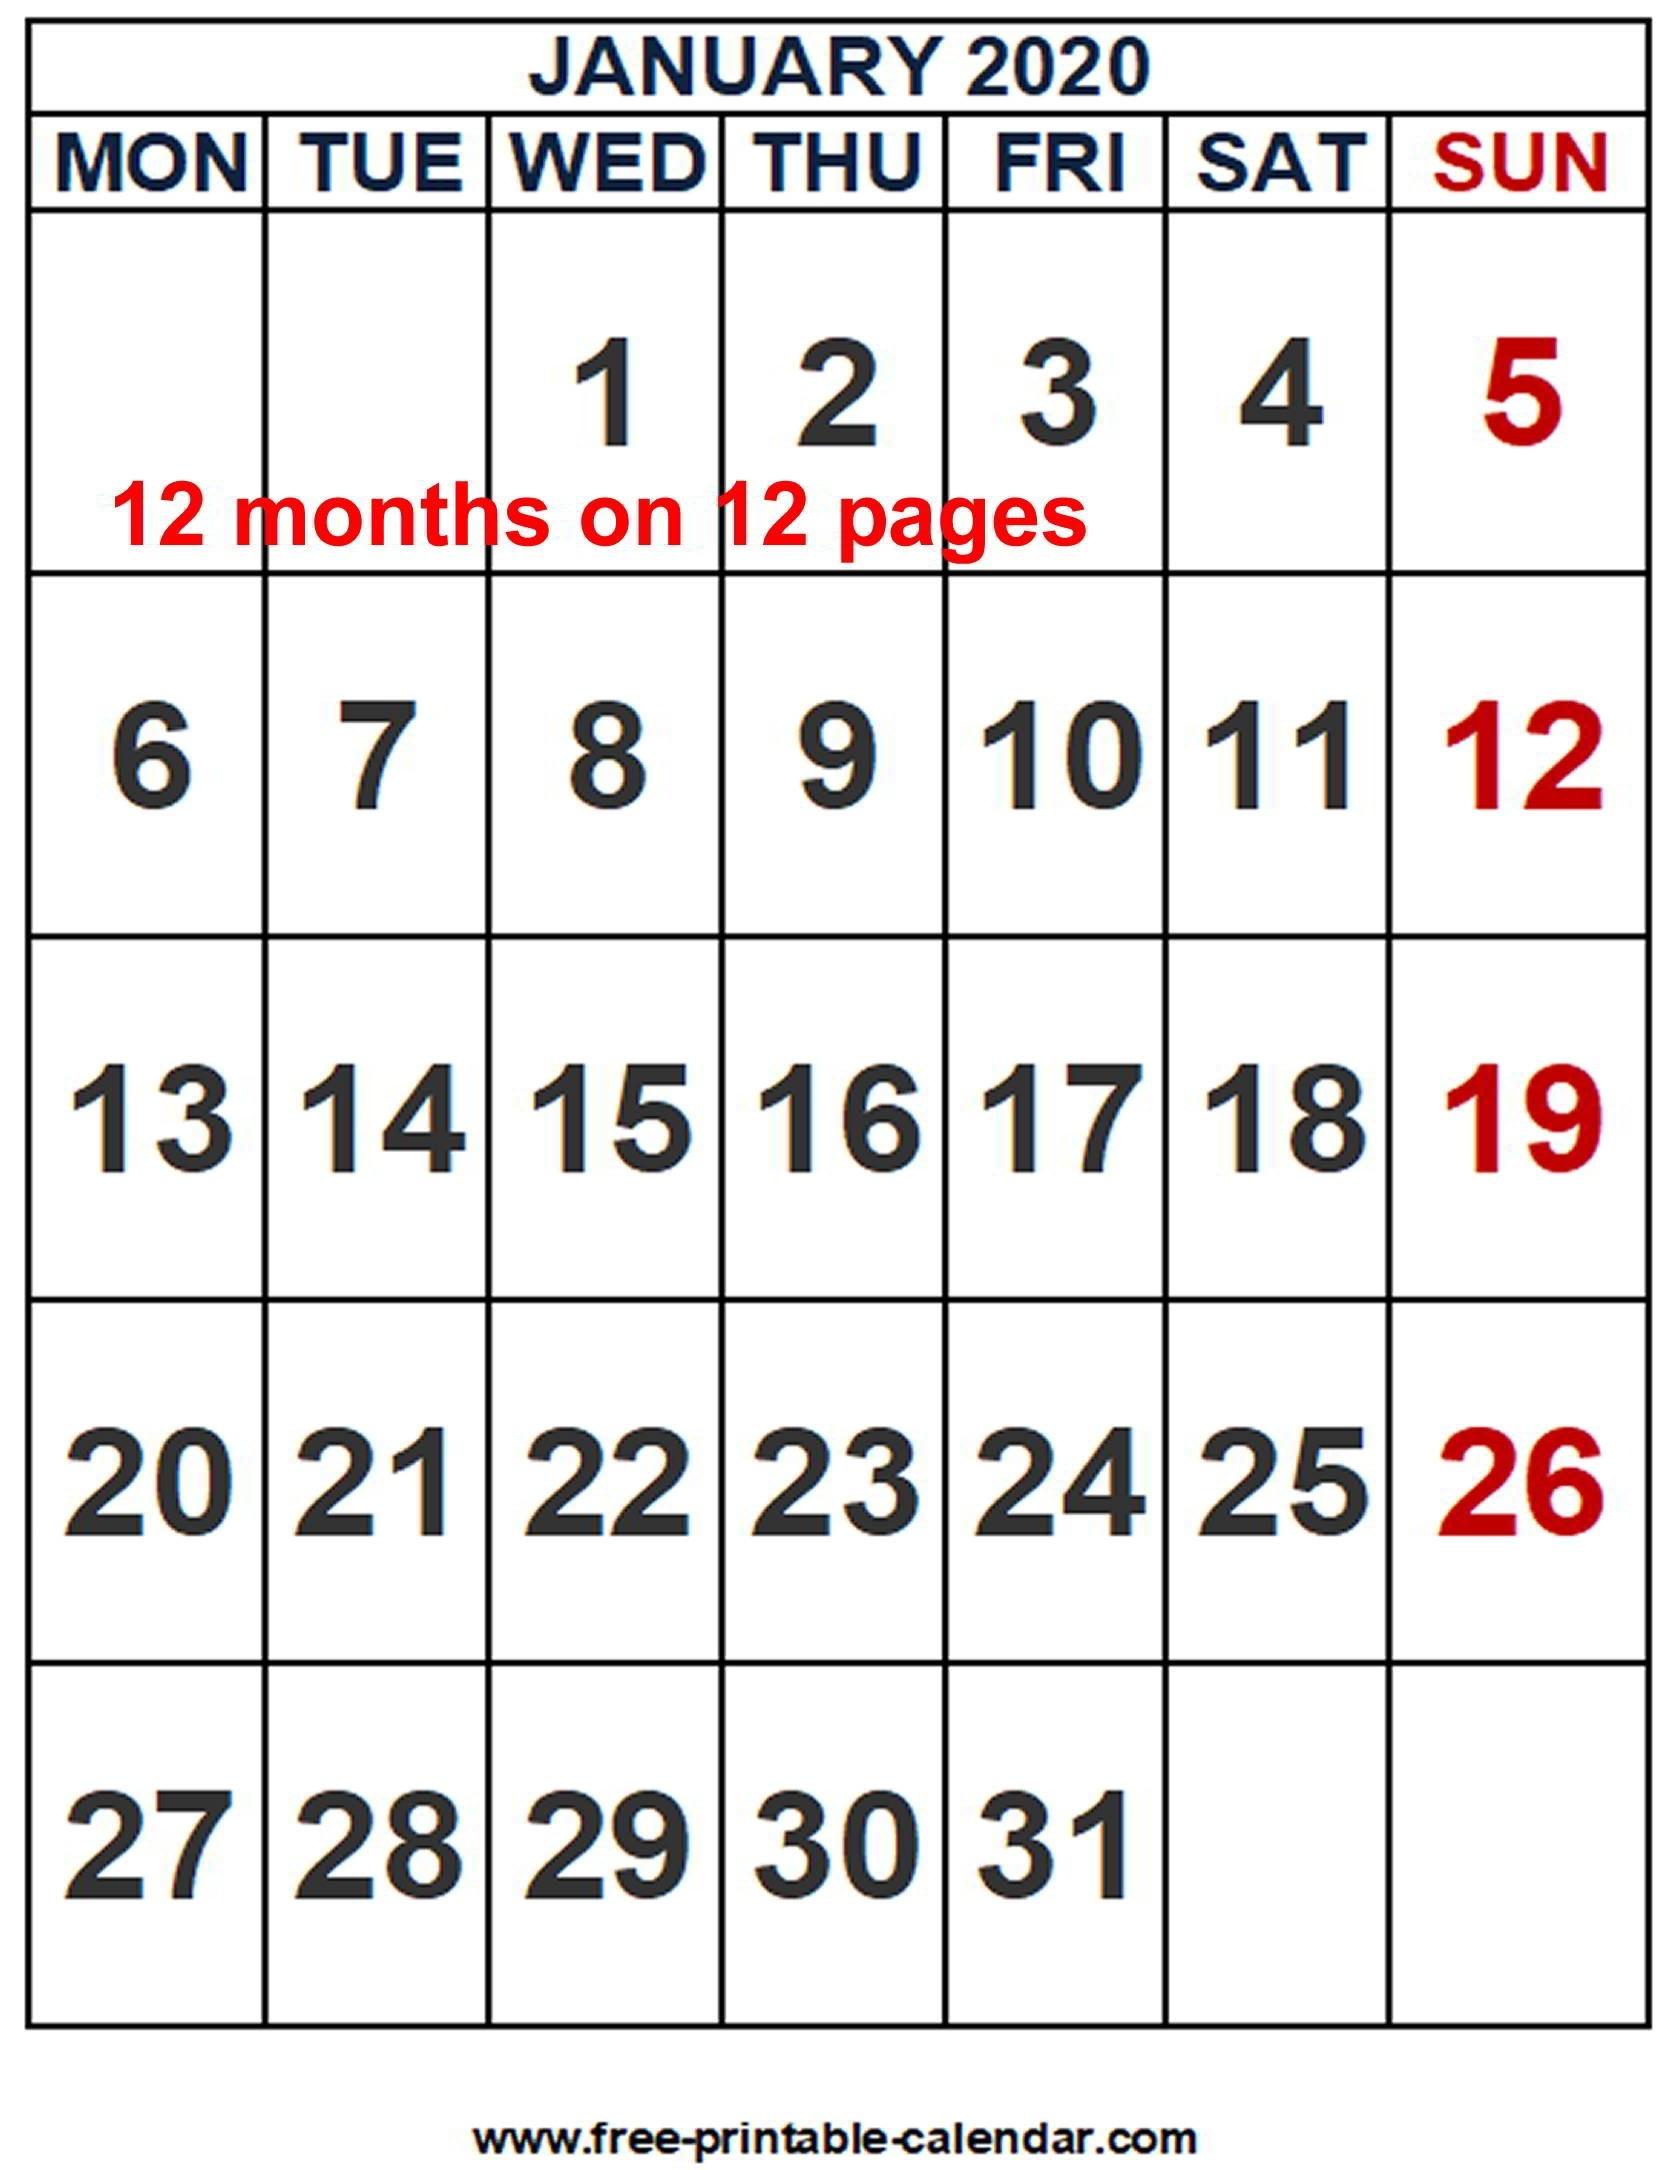 2020 Calendar Word Template - Free-Printable-Calendar-Microsoft Word 2020 Calendar Template